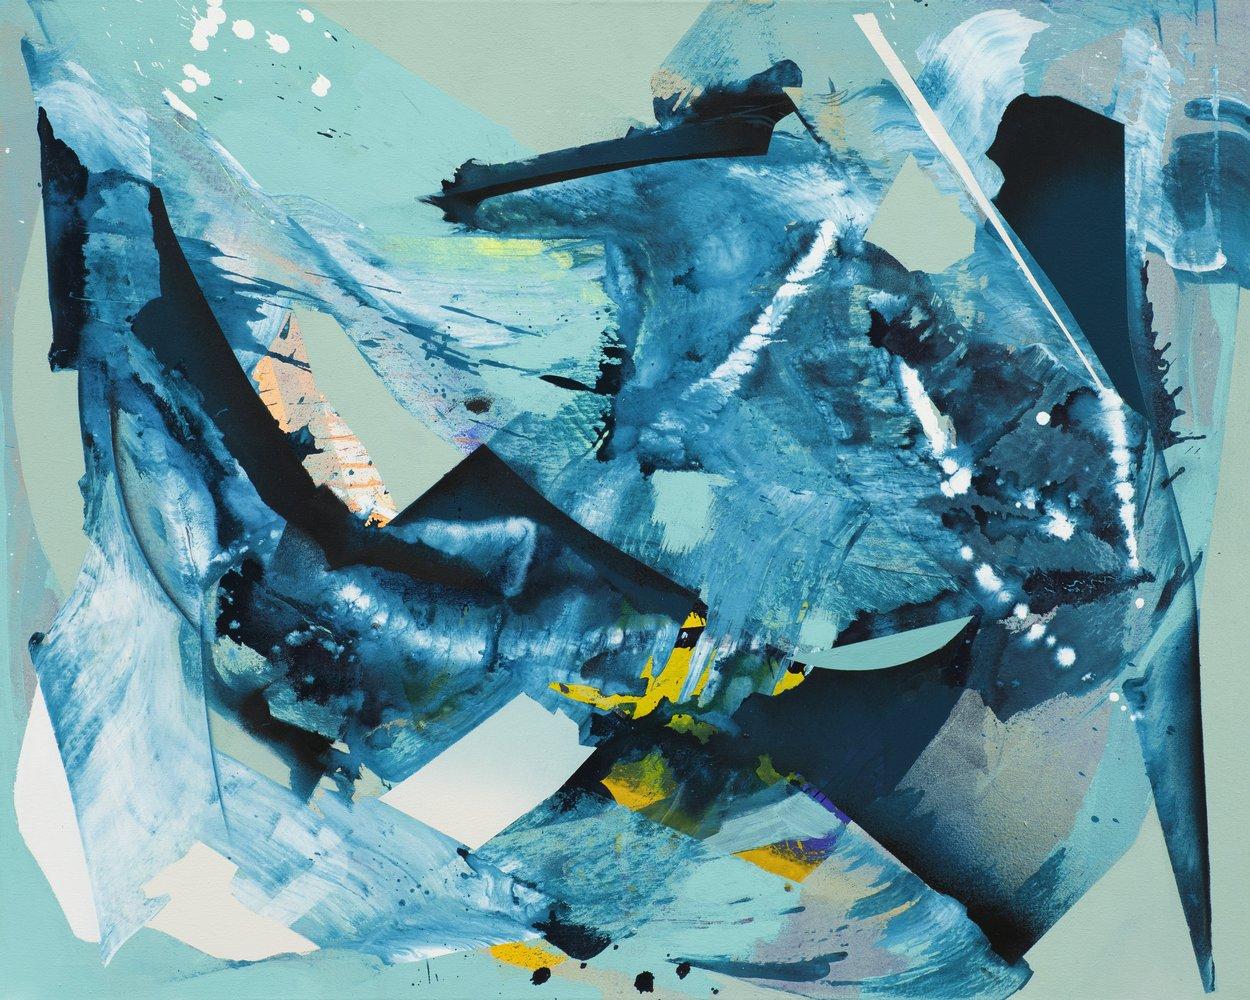 Julia Benz | Ice Skating, acrylic ,ink, spraypaint on canvas, 80 x 100 cm, 2021